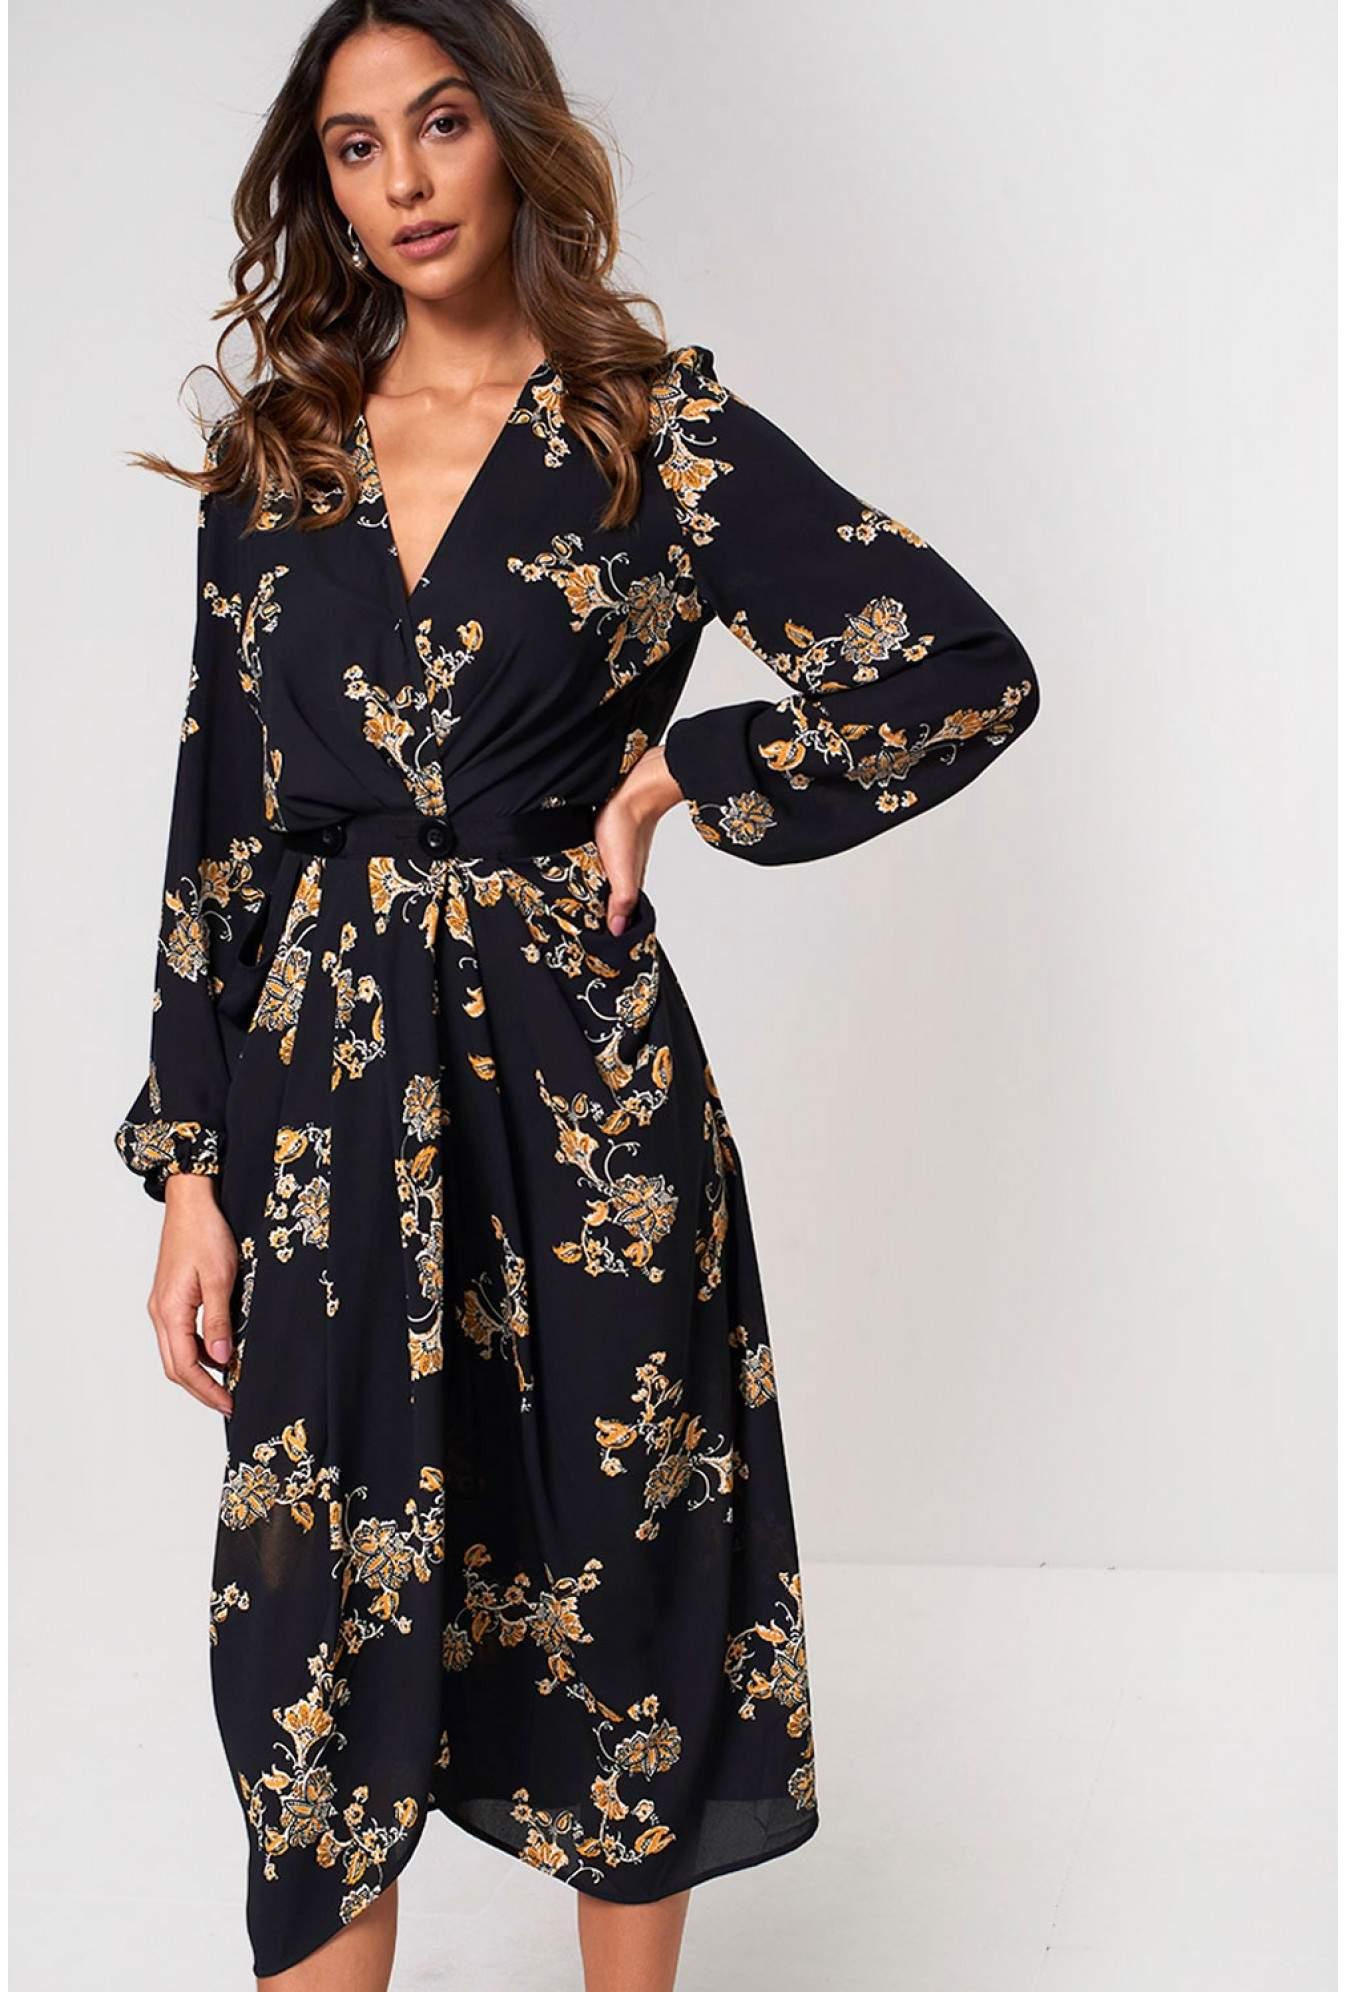 69cec909e Marilla Long Sleeve Printed Midi Dress in Black